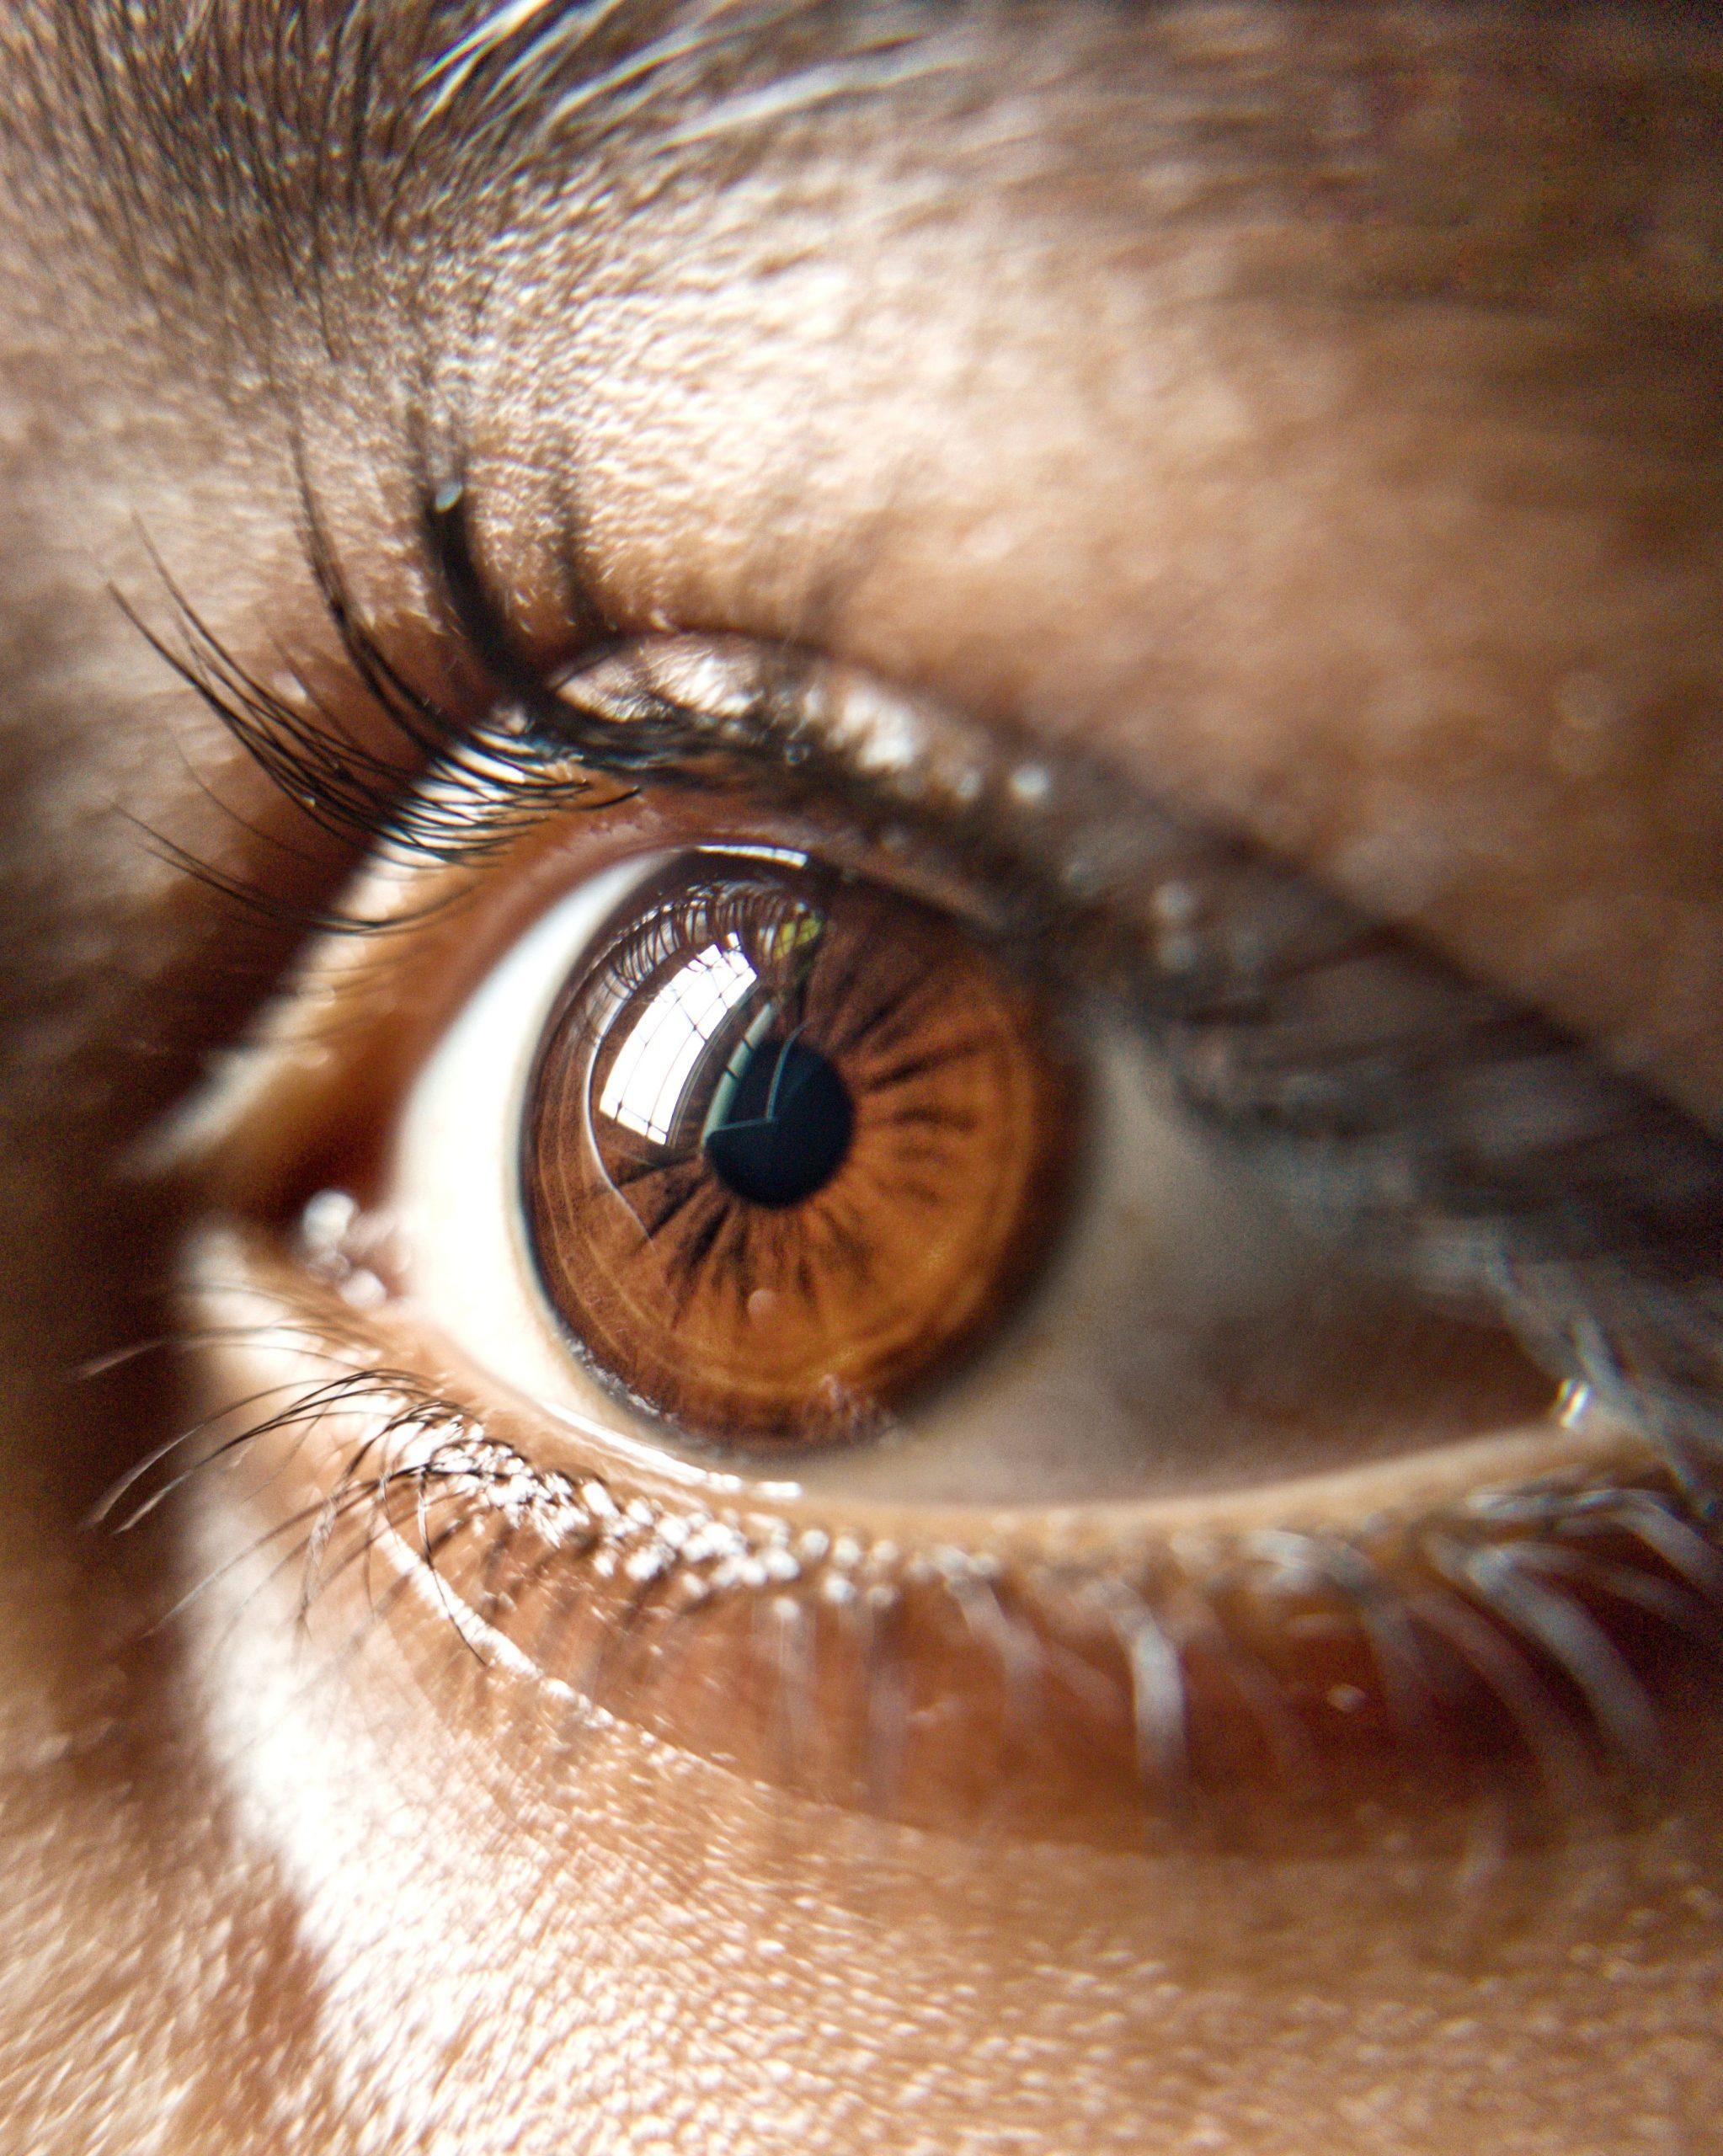 Micro eyeshoot